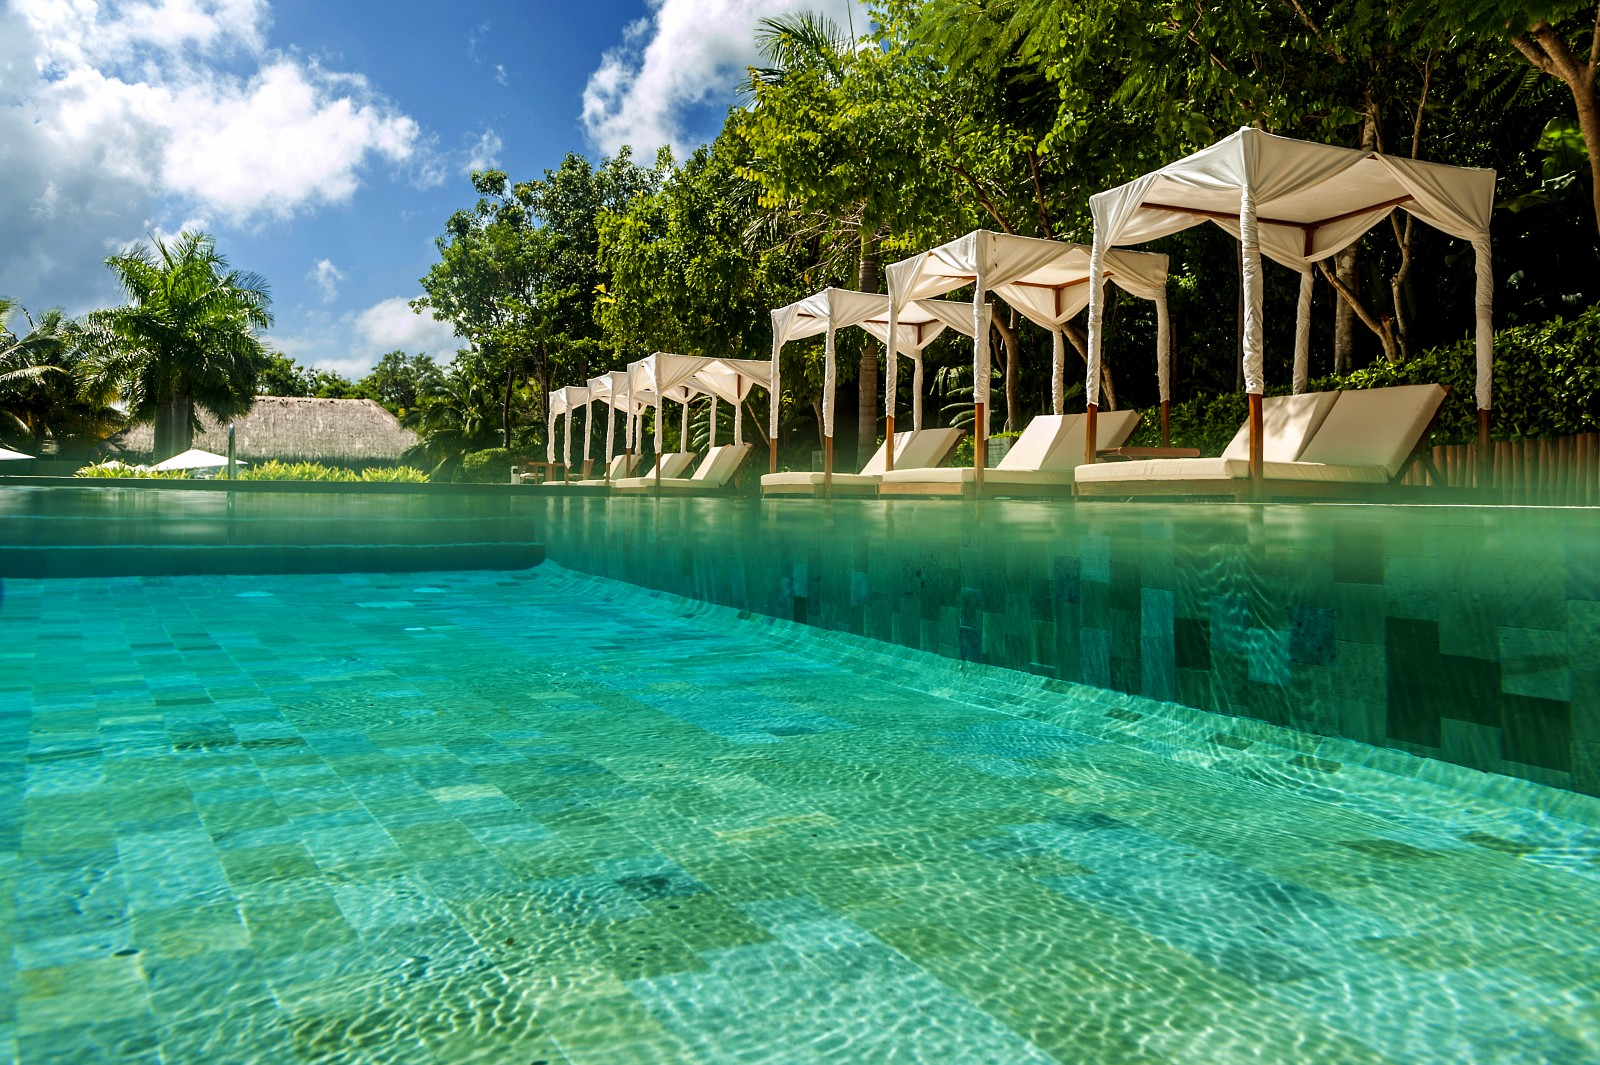 Travel Agency All-Inclusive Resort Grand Velas Riviera Maya 008